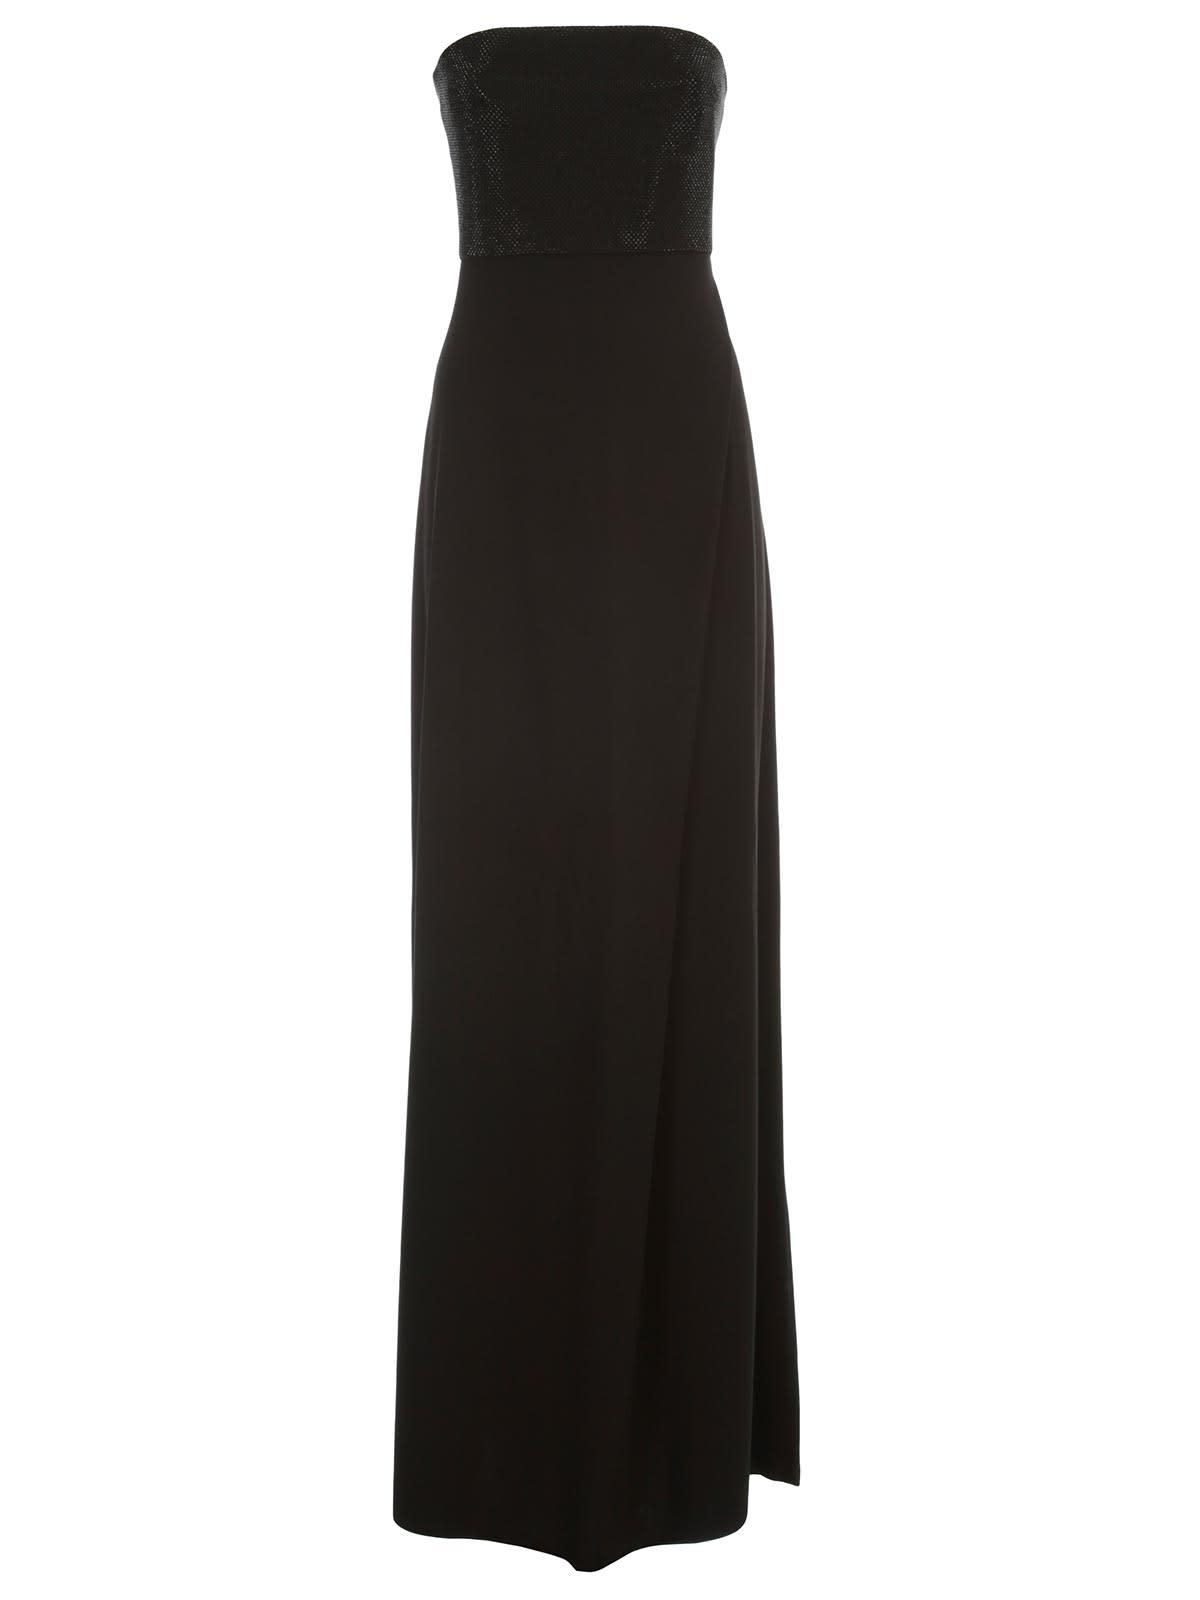 Buy Emporio Armani Maxi Dress Brassiere W/paillettes online, shop Emporio Armani with free shipping